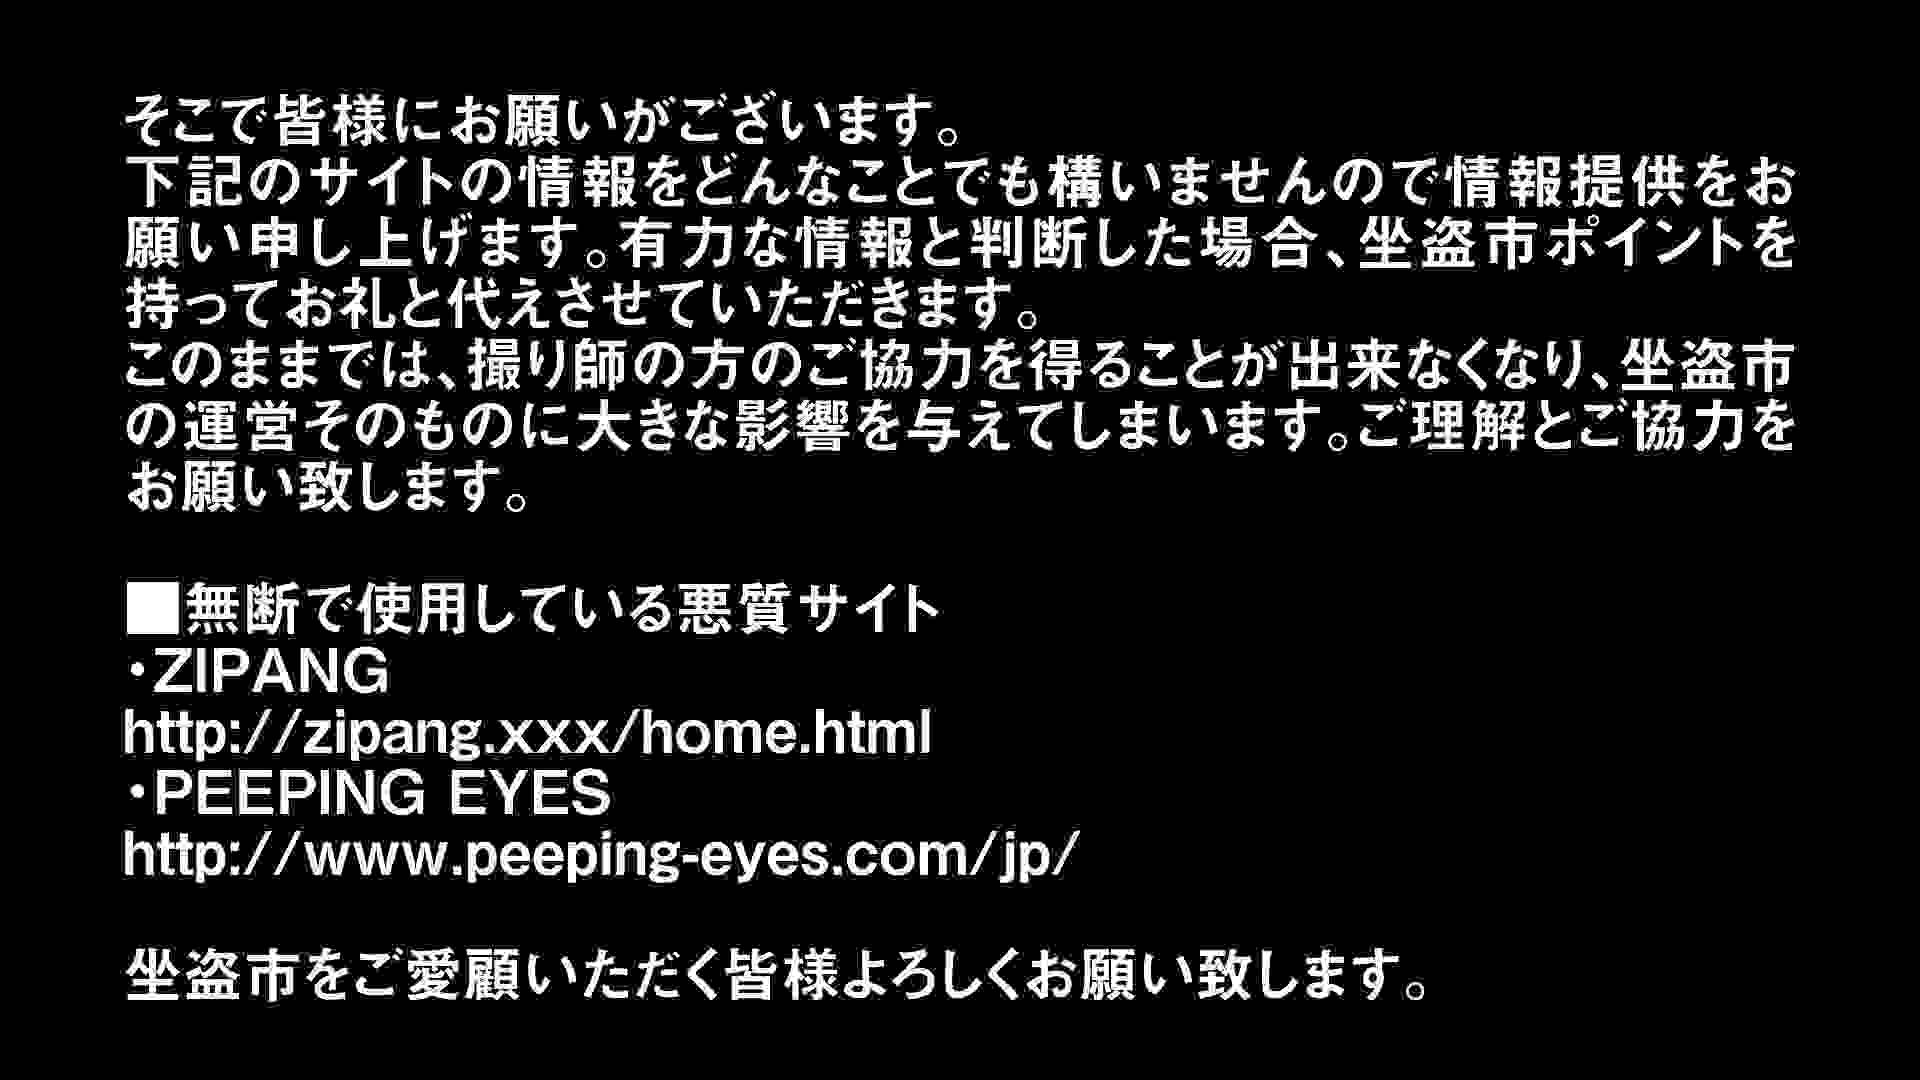 Aquaな露天風呂Vol.301 OLのエロ生活 すけべAV動画紹介 112連発 38